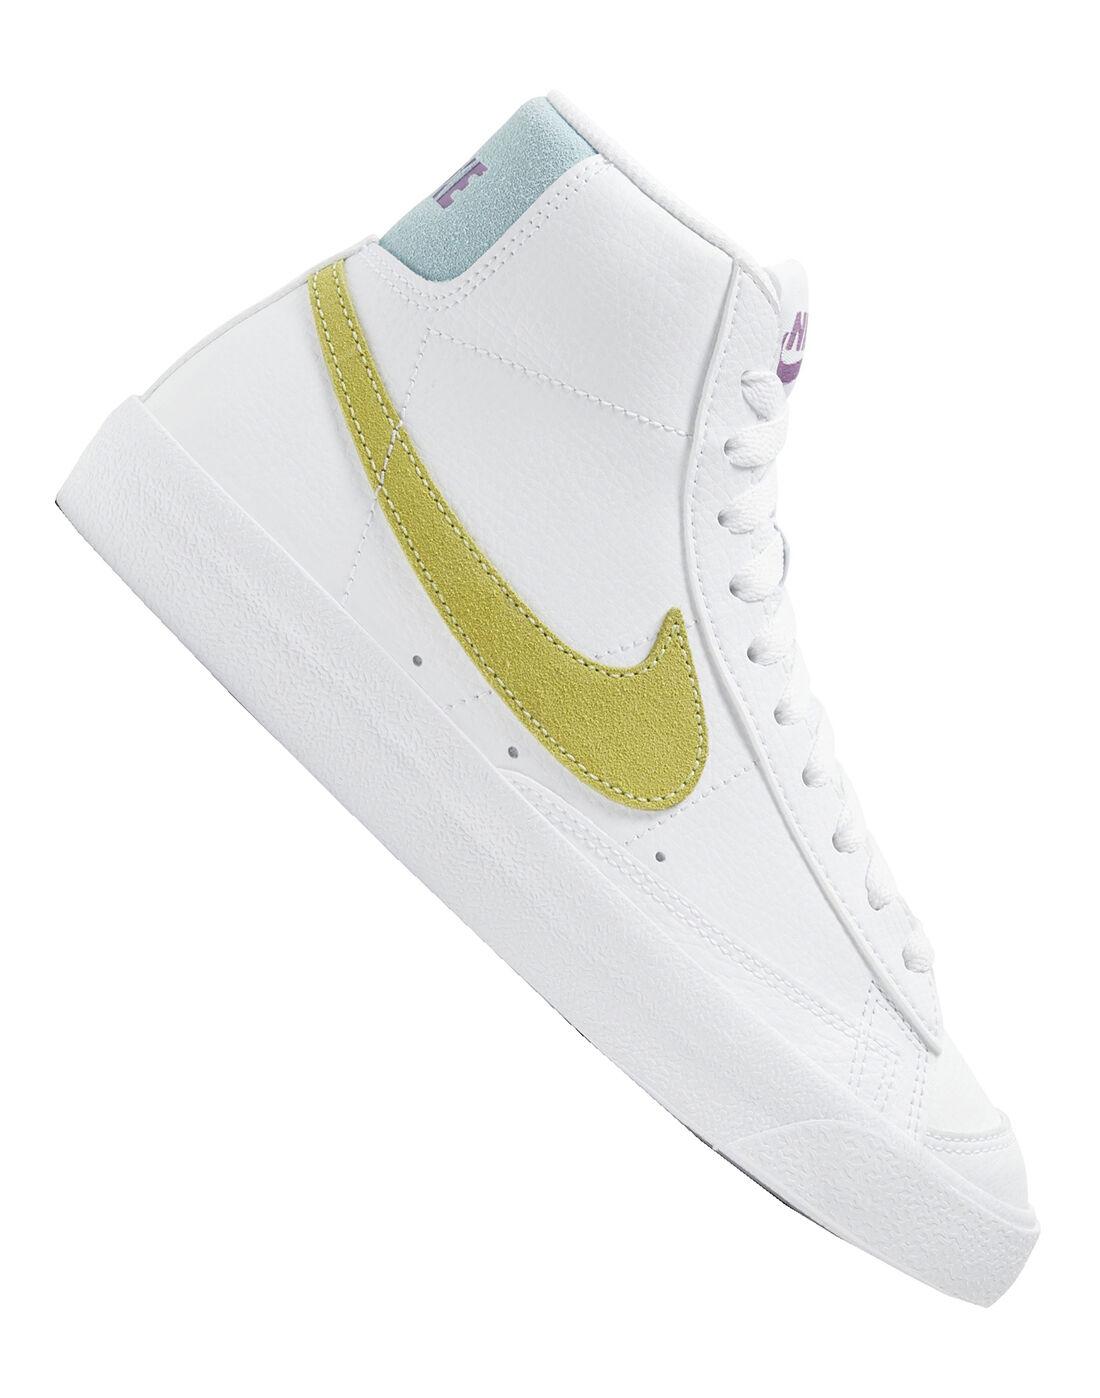 Nike Older Kids Blazer Mid - White | buy air jordan 11 retro low EU